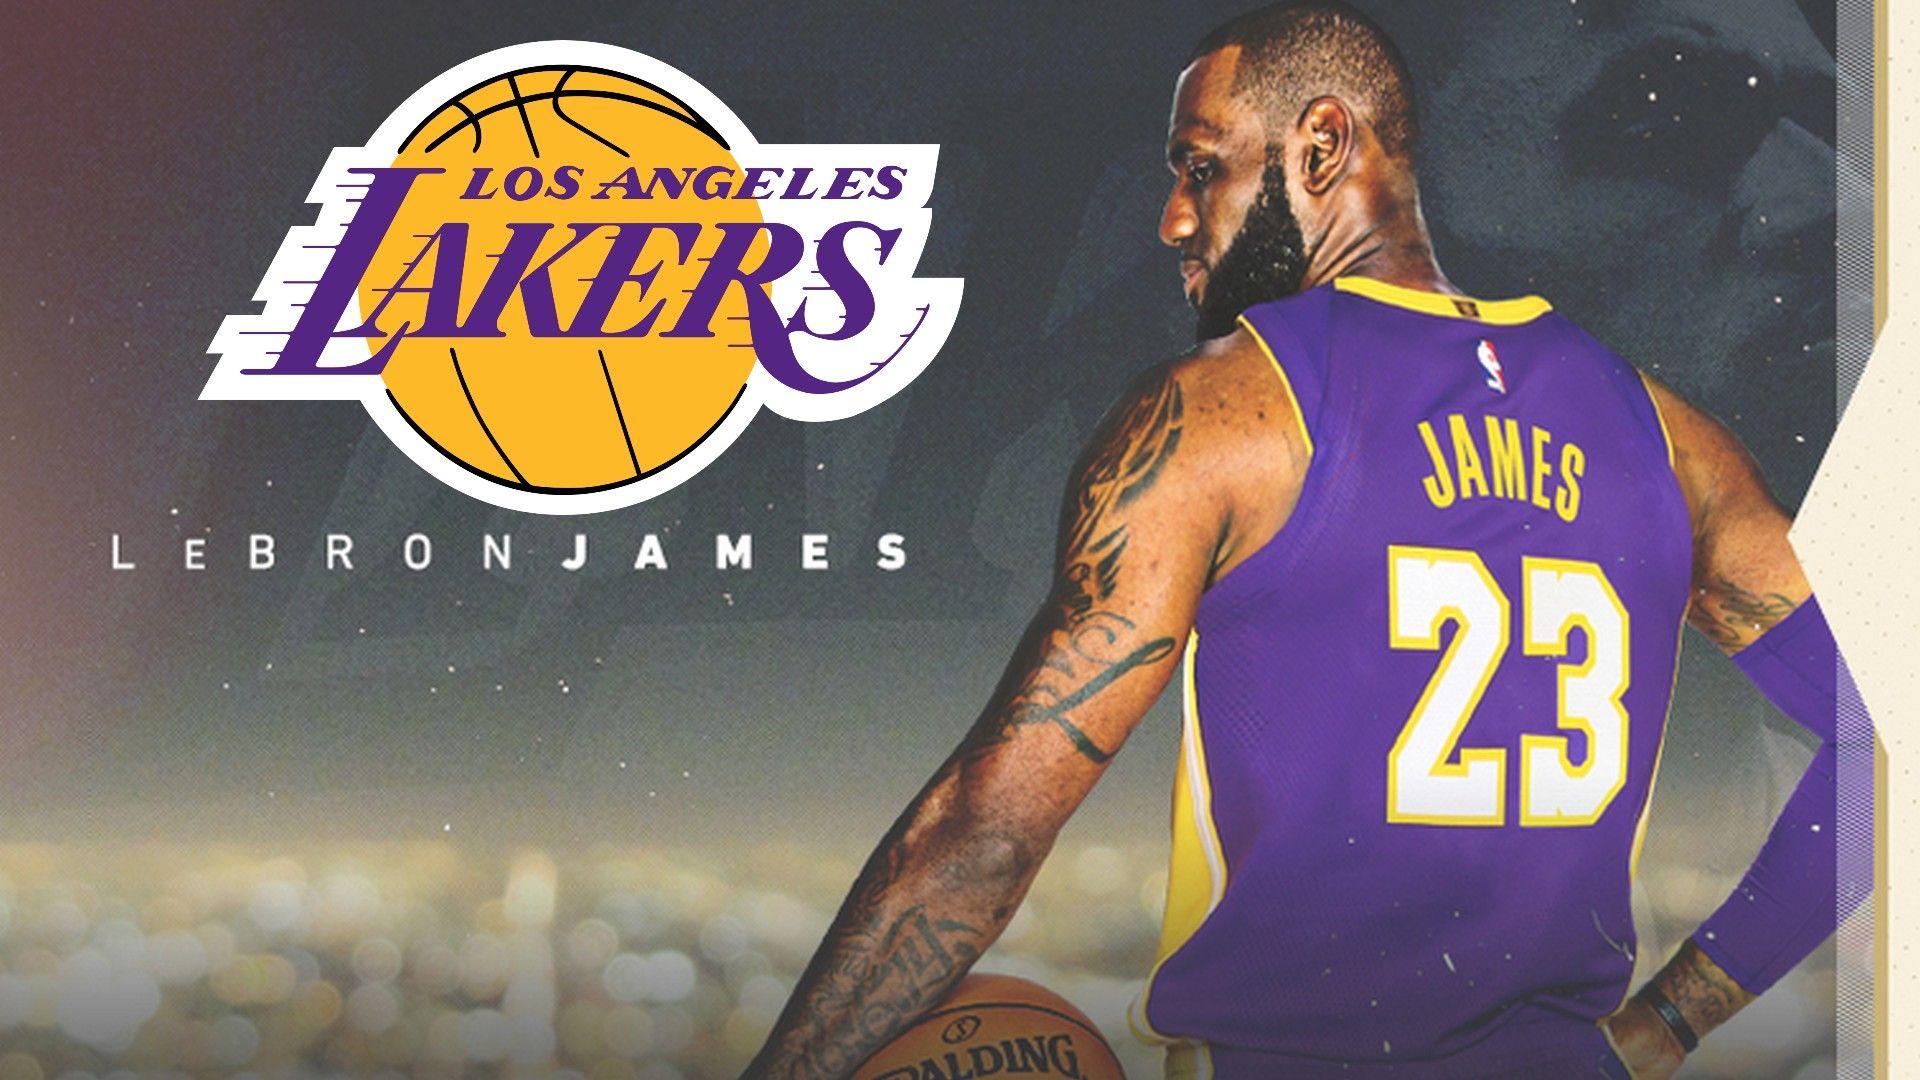 Wallpapers Hd Lebron James Lakers Lebron James Lakers Lebron James Lakers